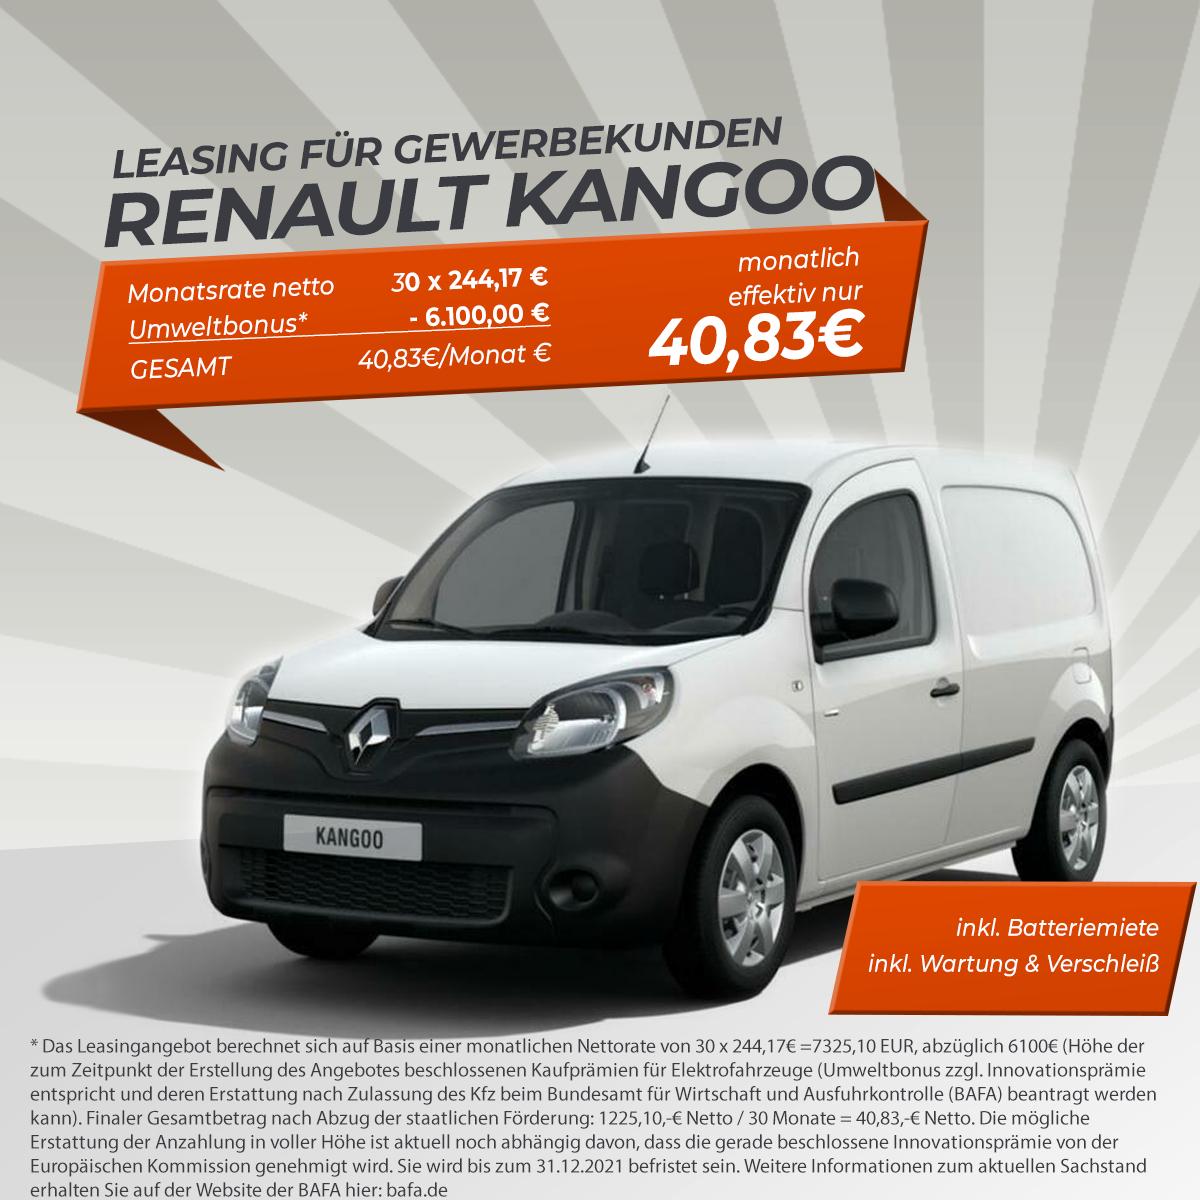 (Gewerbeleasing) Renault Kangoo Z.E. inkl Batterie, Wartung & Verschleiß, 30 Monate 10tkm, eff. 62,49€ mtl. | 230km el. Reichweite, LF 0,12